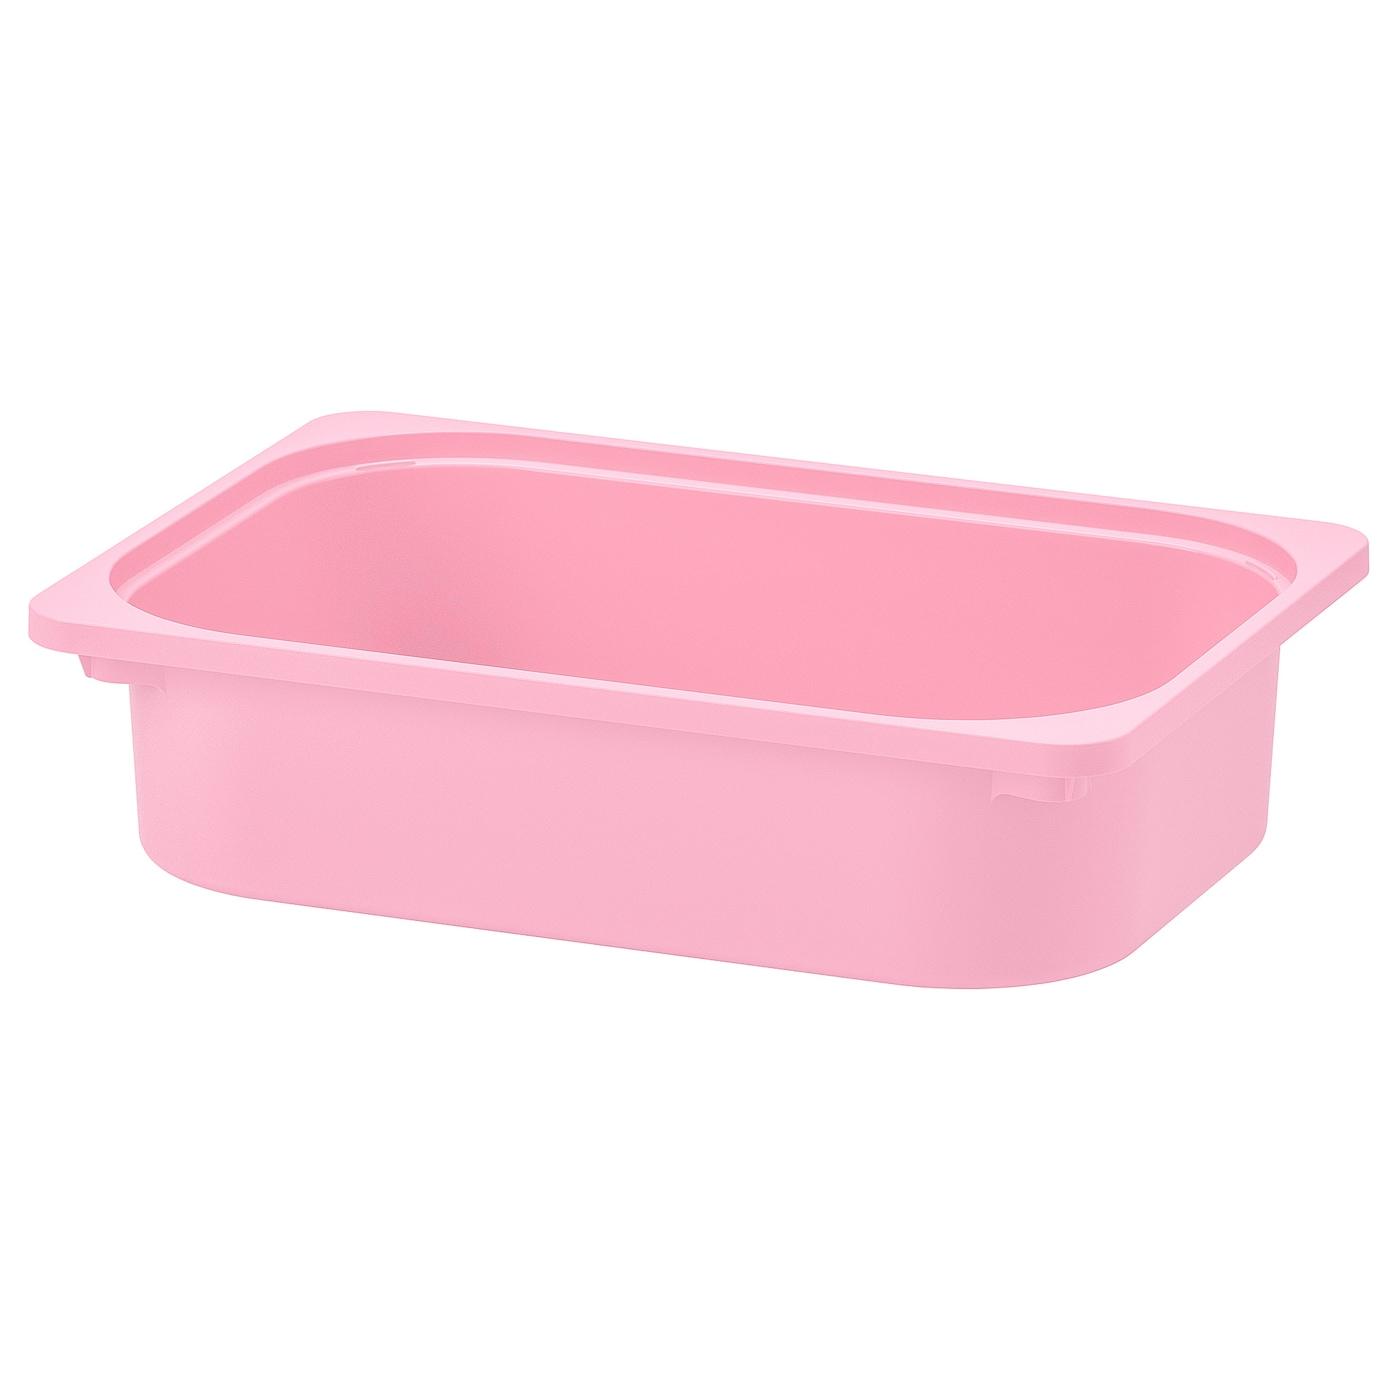 IKEA TROFAST Box in rosa; 42cm x 30cm x 23cm